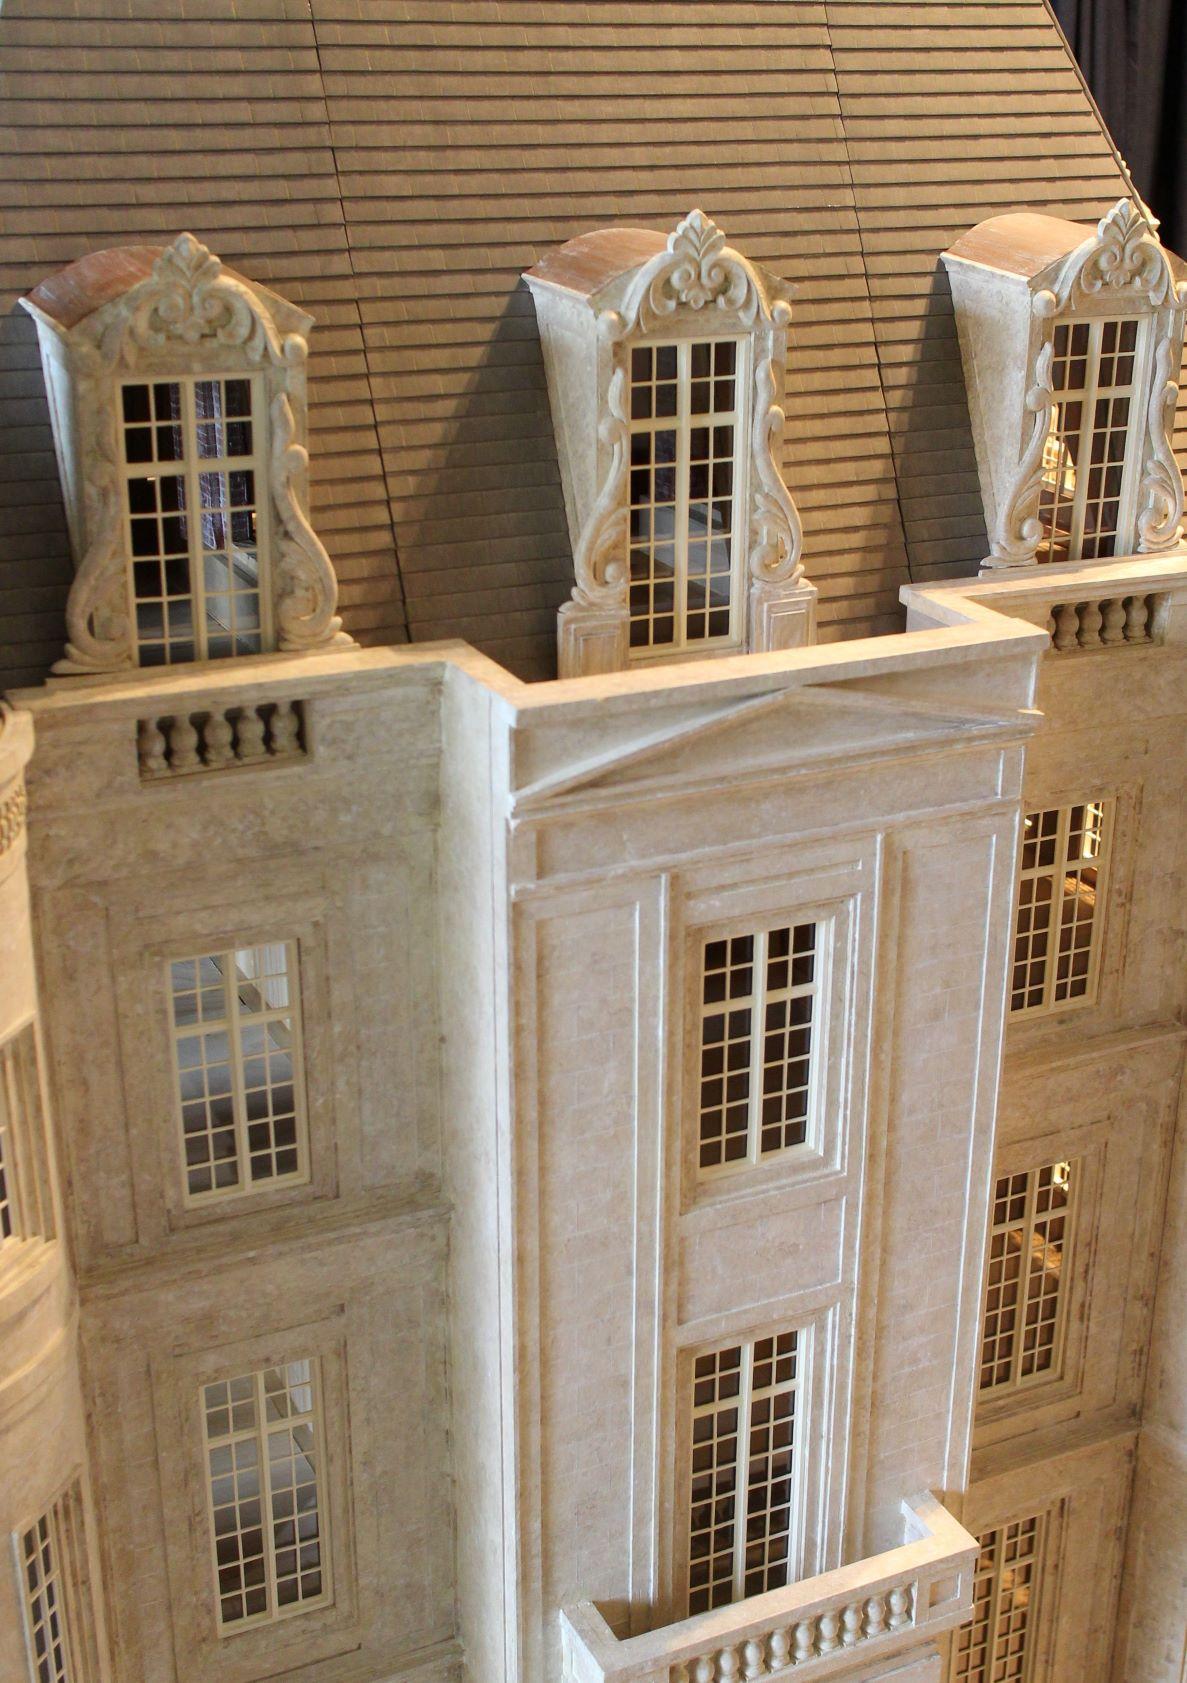 Pediment & Balconies